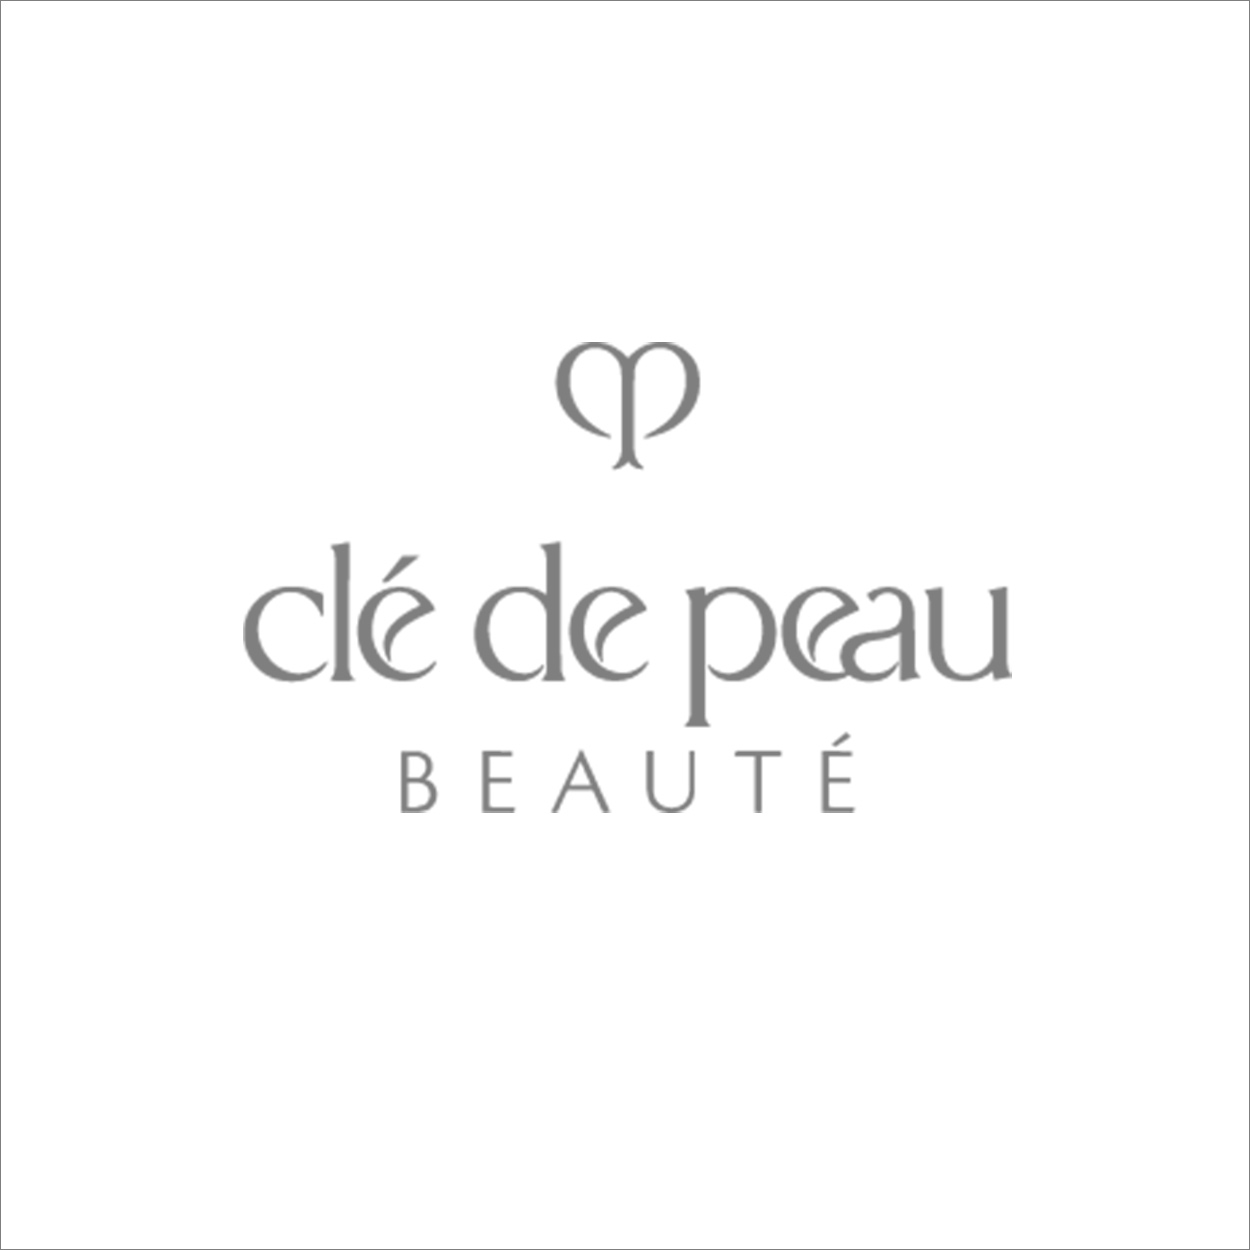 cle_de_peau_logo.jpg